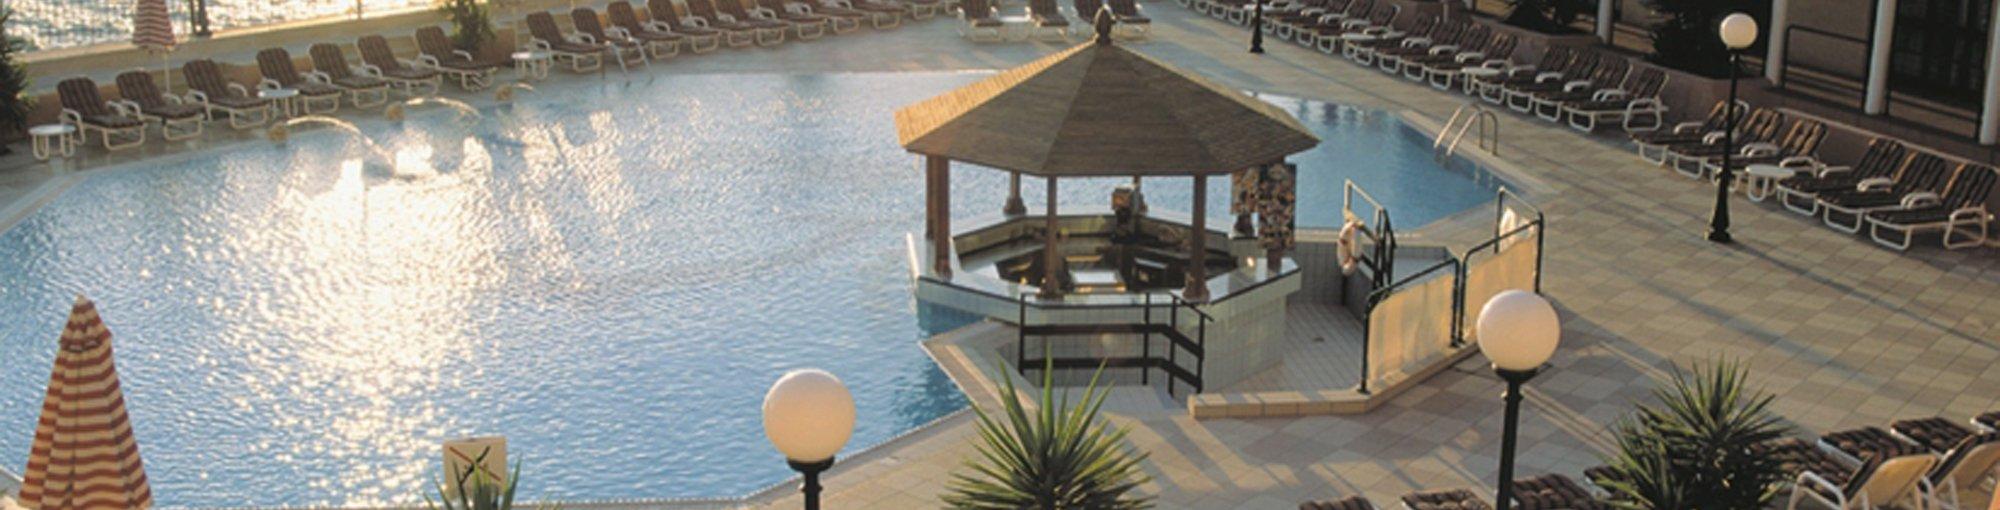 Radisson Blu Bay Point Resort